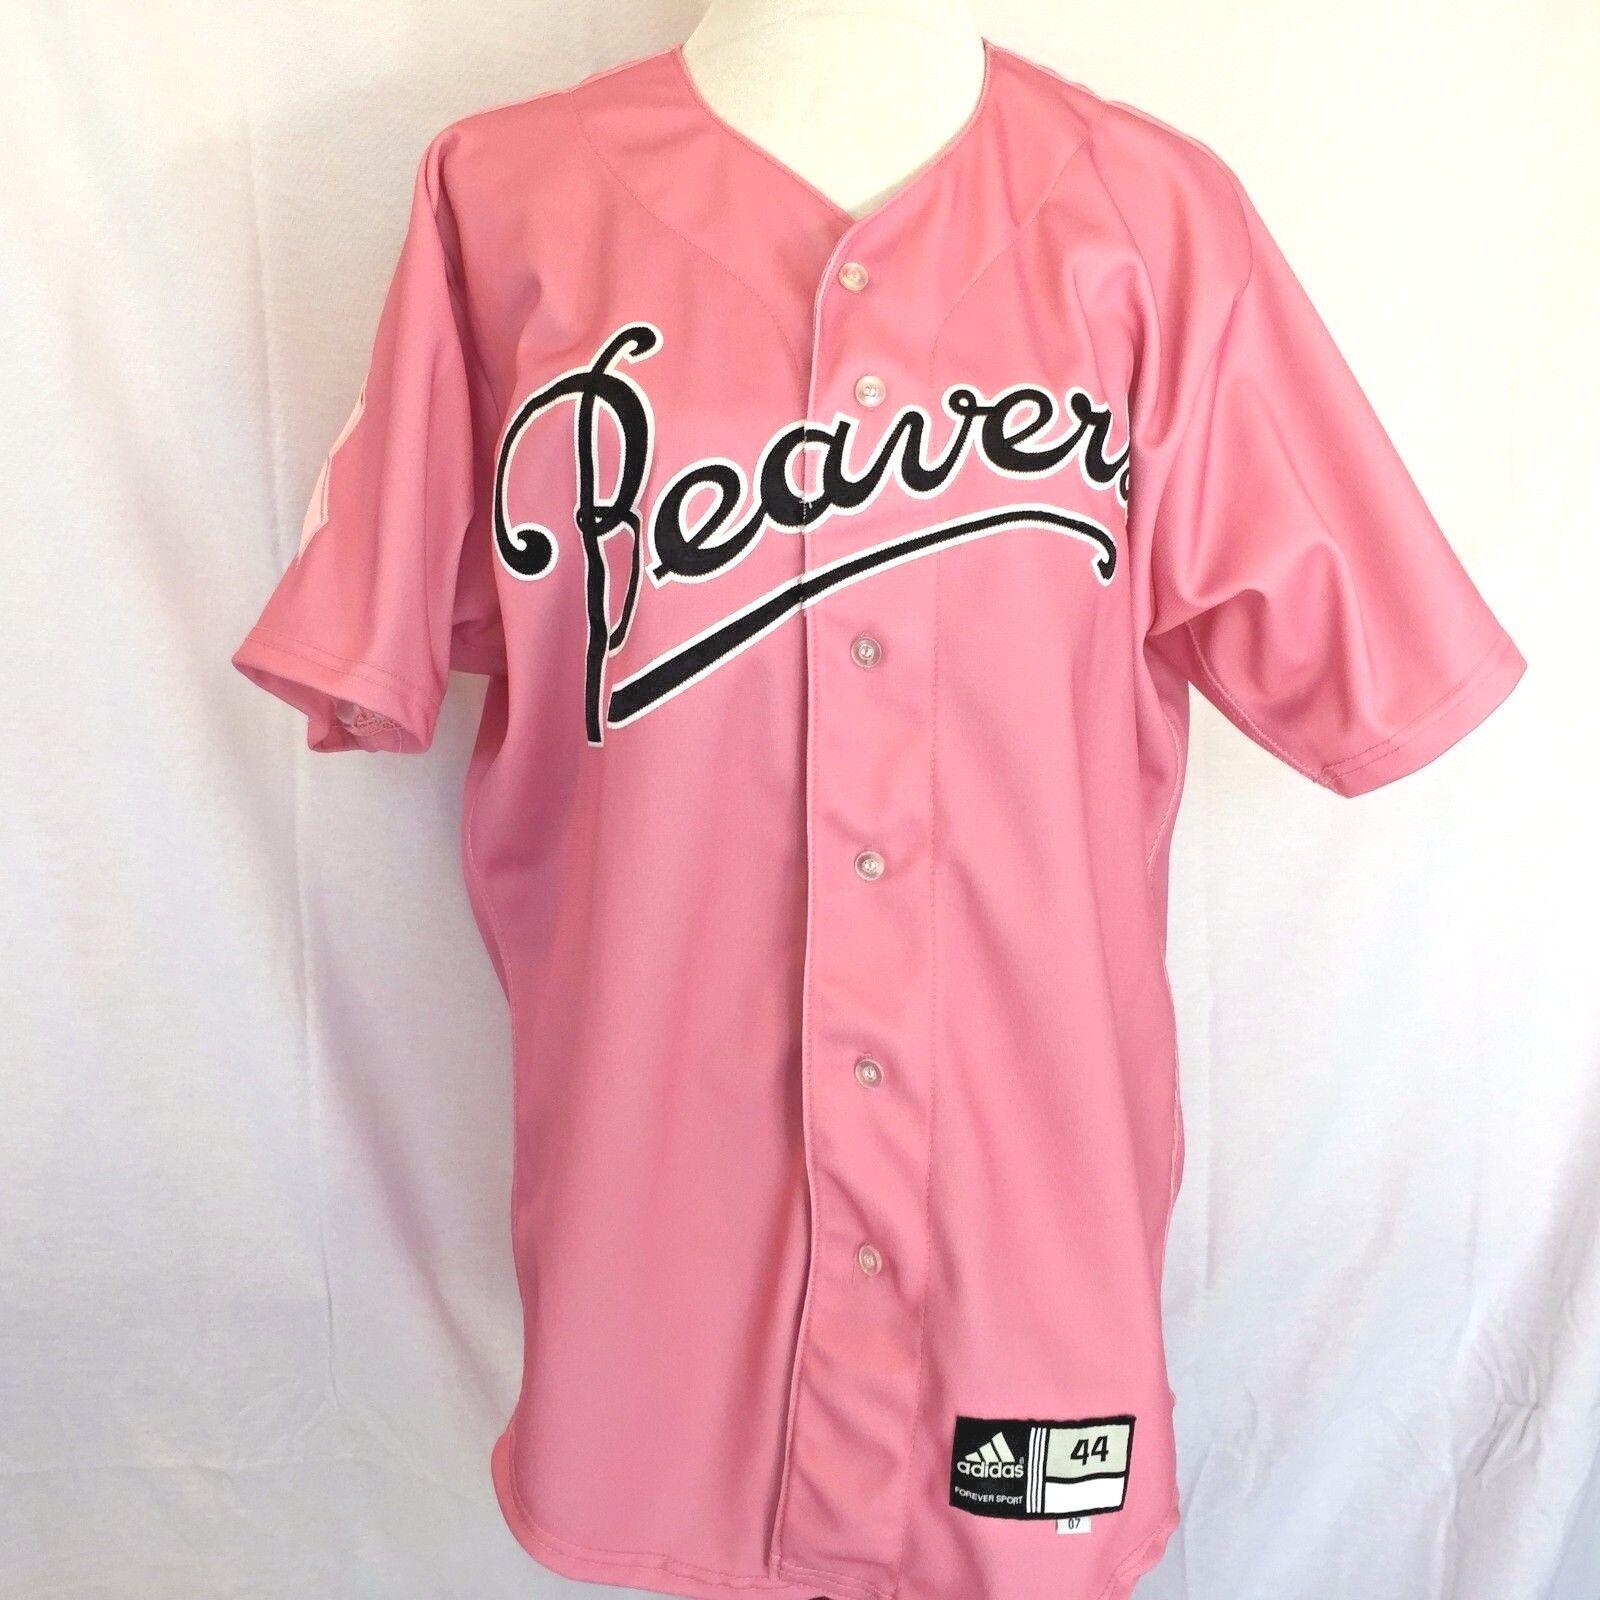 PORTLAND BEAVERS Pink Baseball Jersey SZ 44 Breast Cancer Awareness ADIDAS